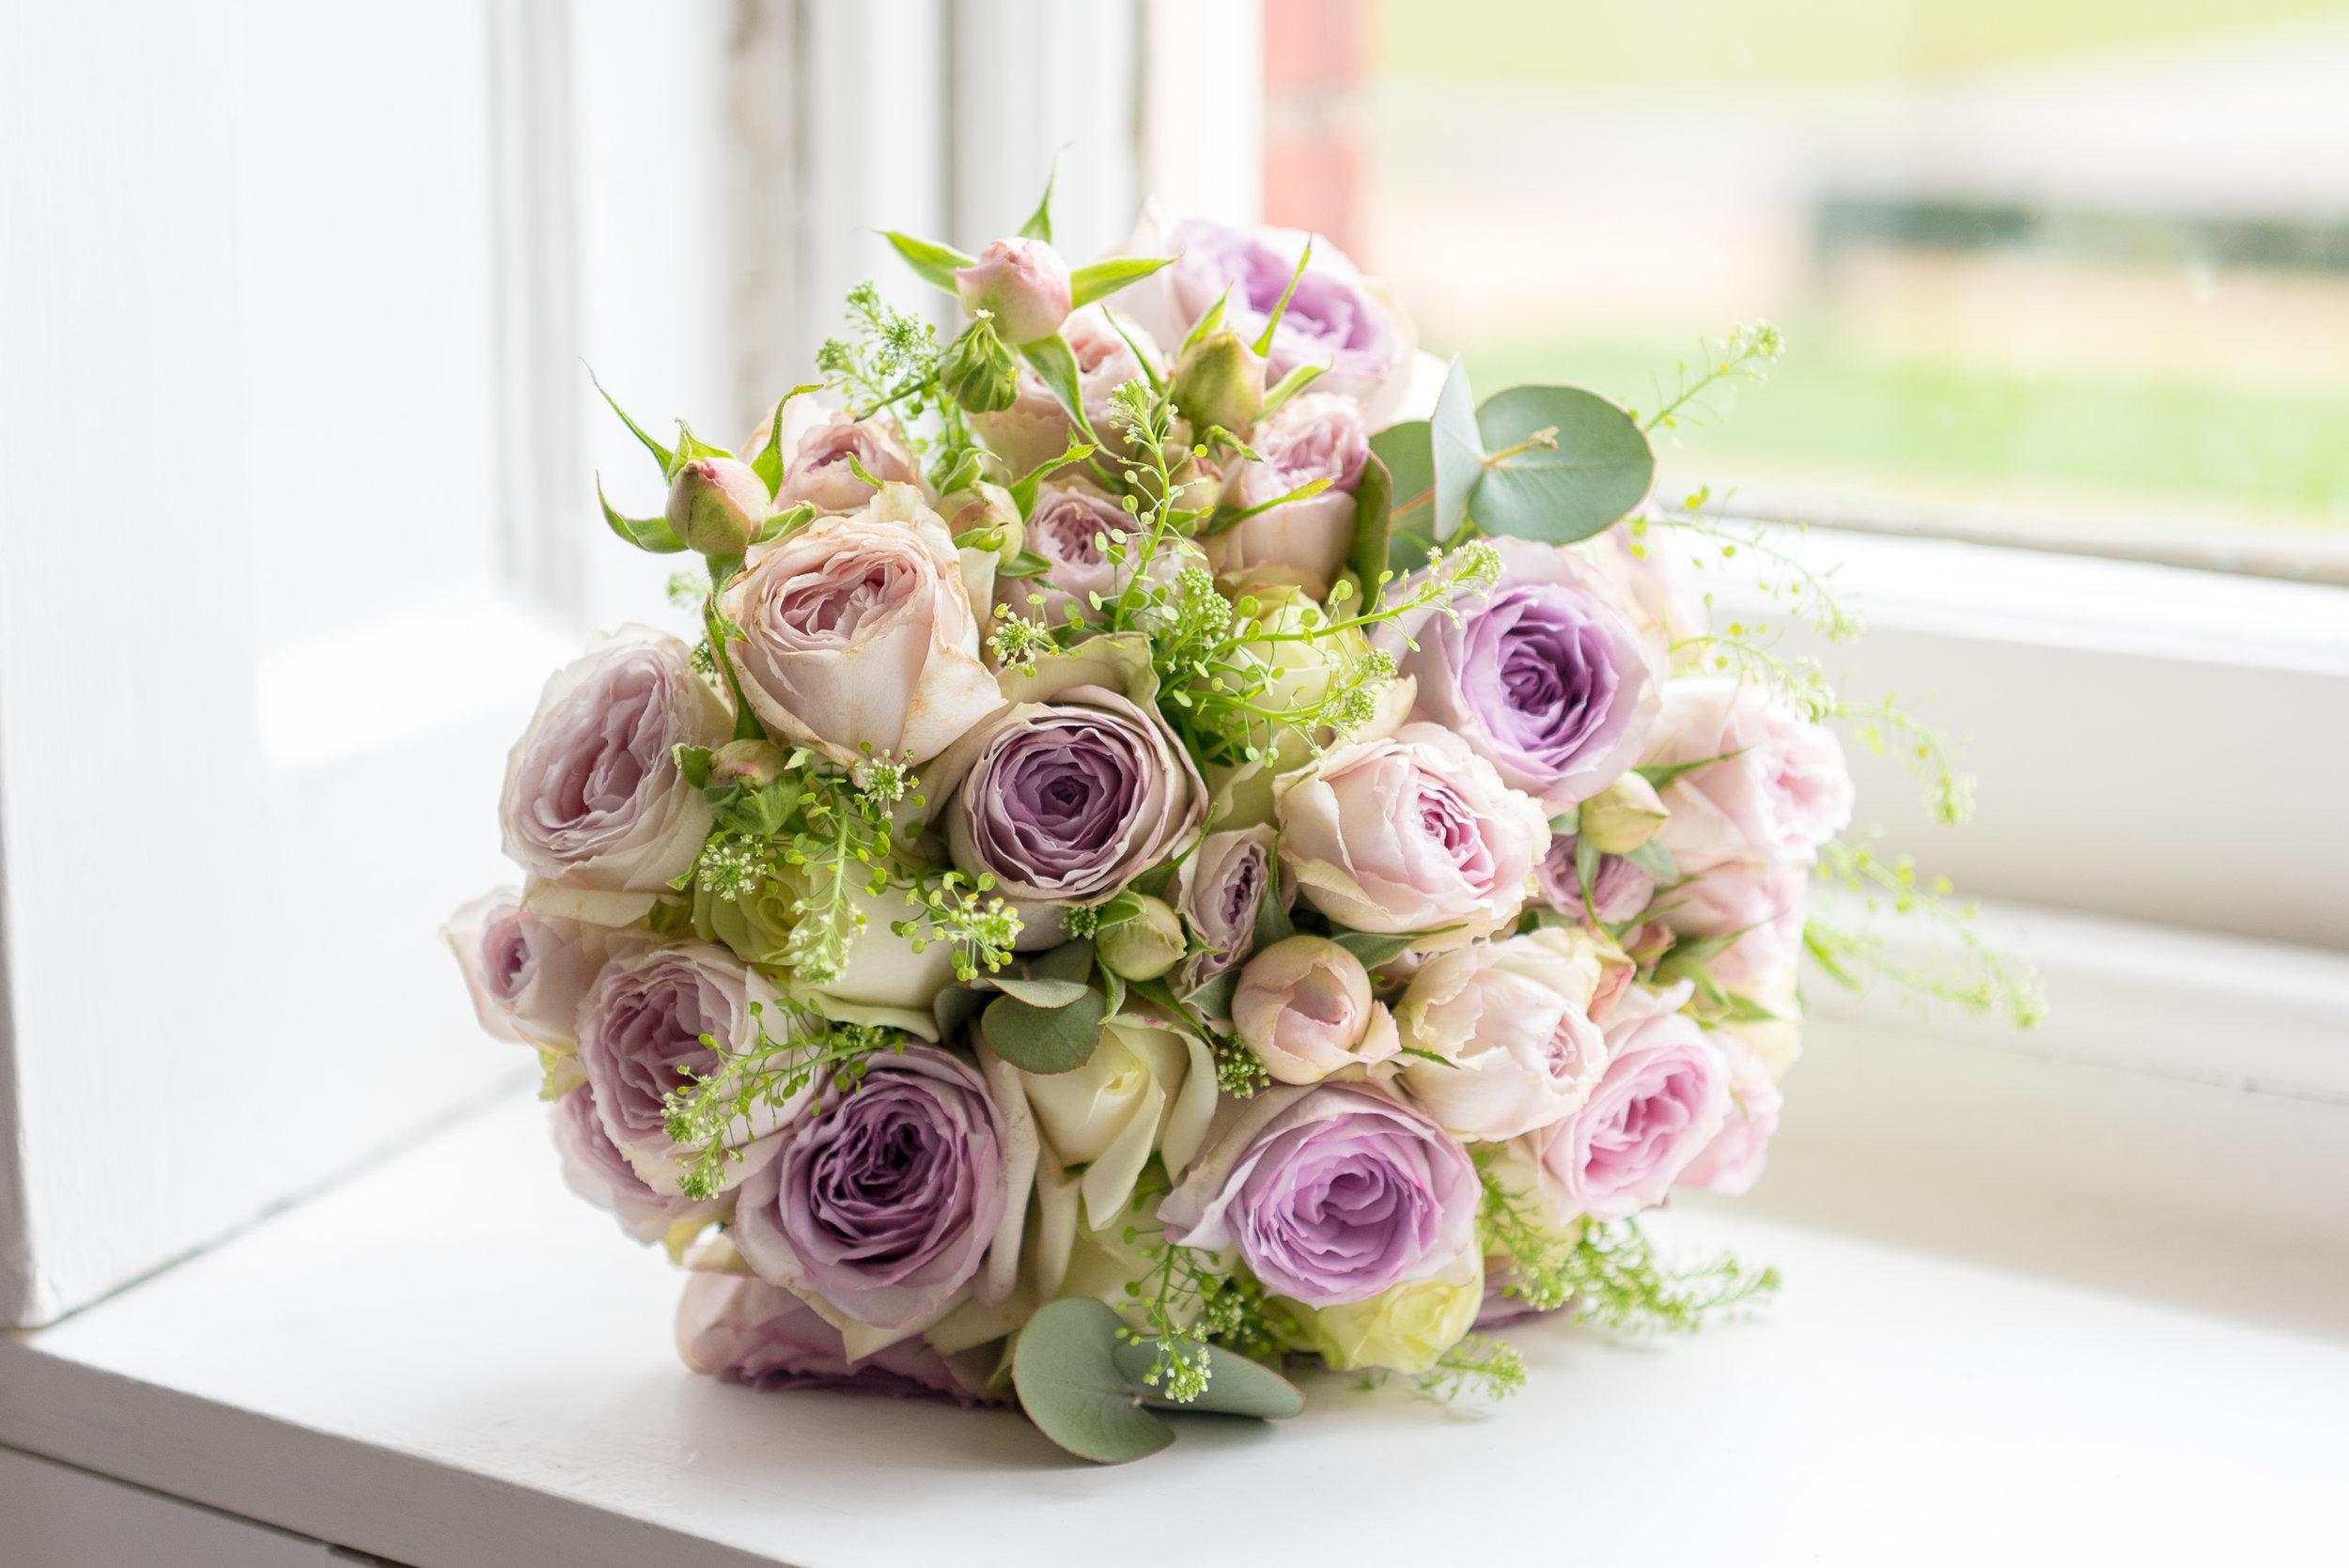 Bridal Bouquet, Royal Modern Wedding|Pink Lavender and Gold| Wren House, Royal Chelsea, London UK